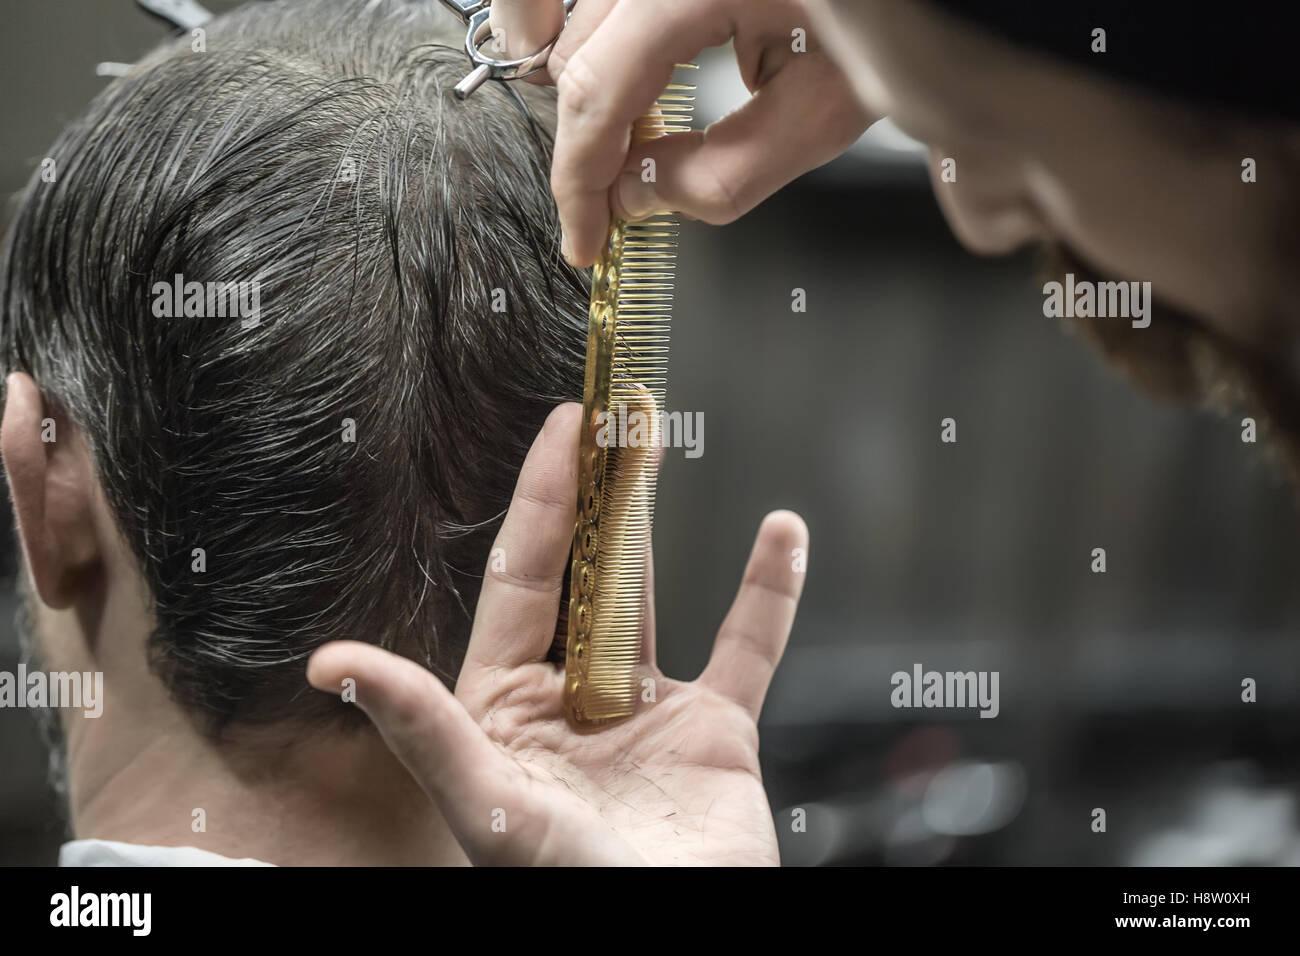 Doing haircut in barbershop - Stock Image